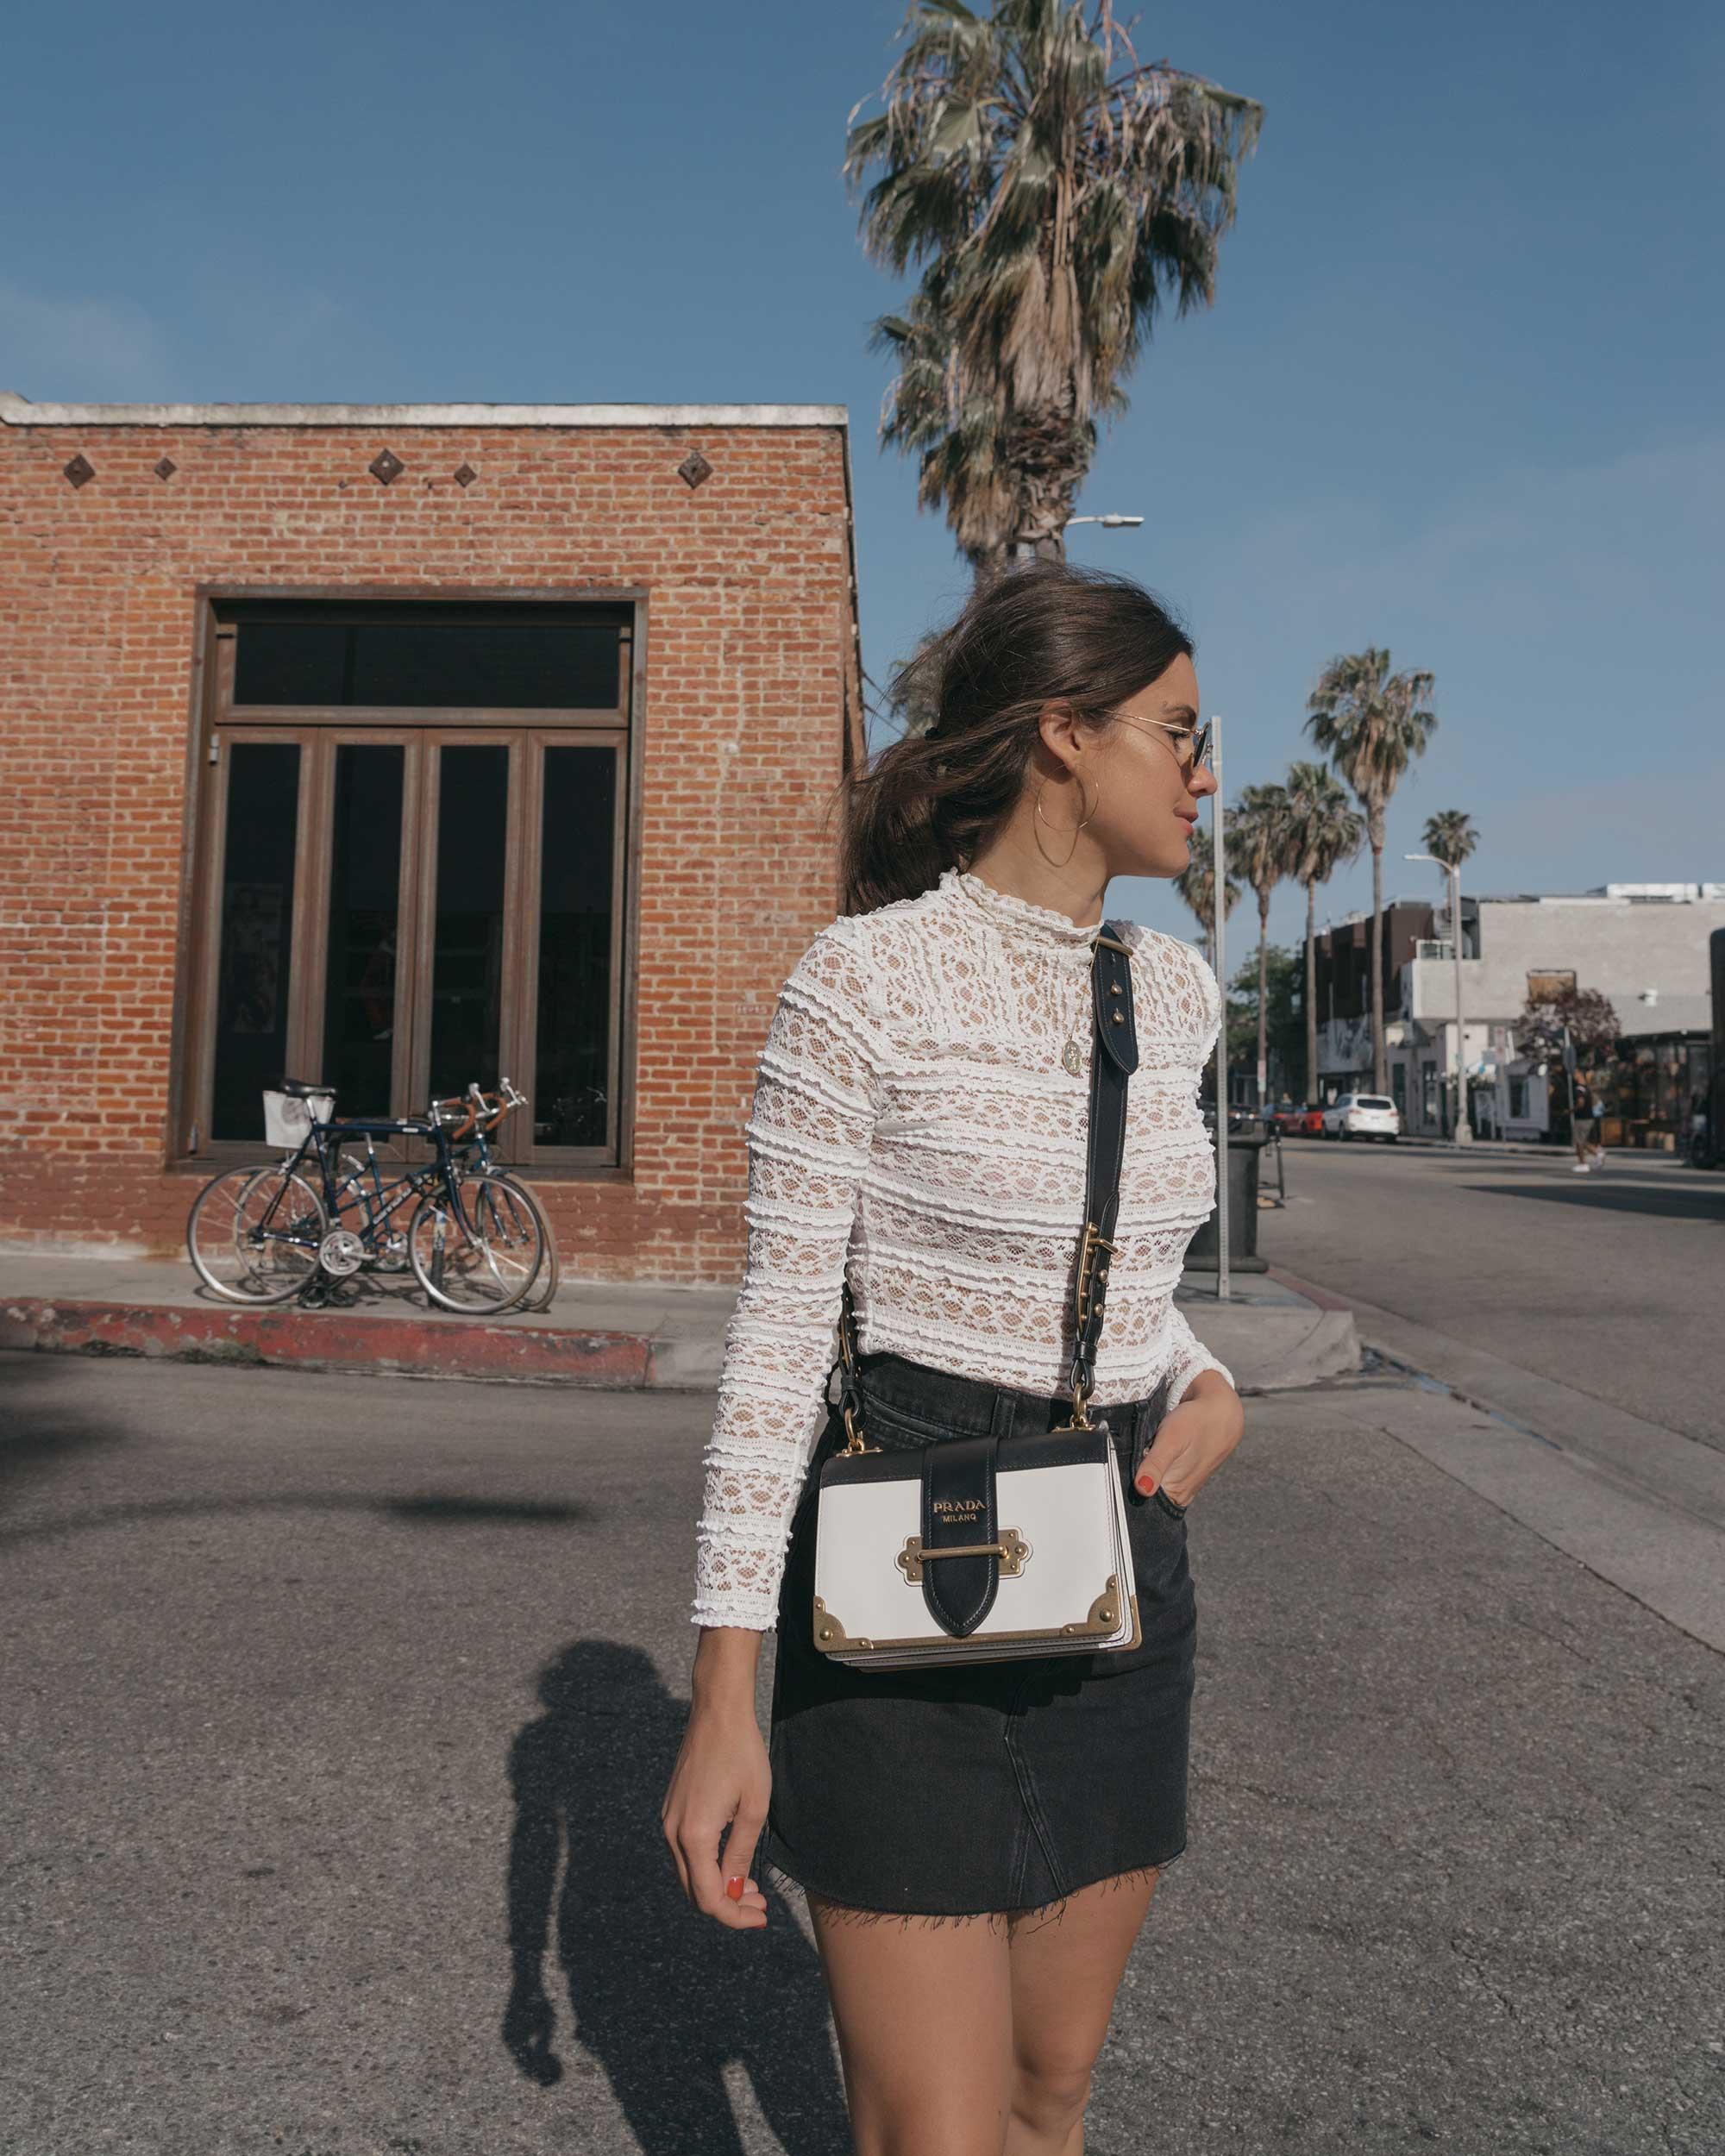 Prada City Saffiano Leather Cahier Bag, Black Denim Skirt, Summer outfit, Abbot Kinney California3.jpg